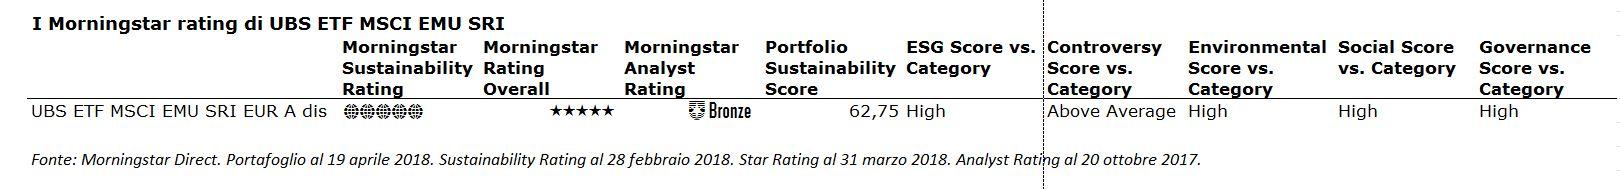 I Morningstar rating di UBS ETF Msci EMU SRI